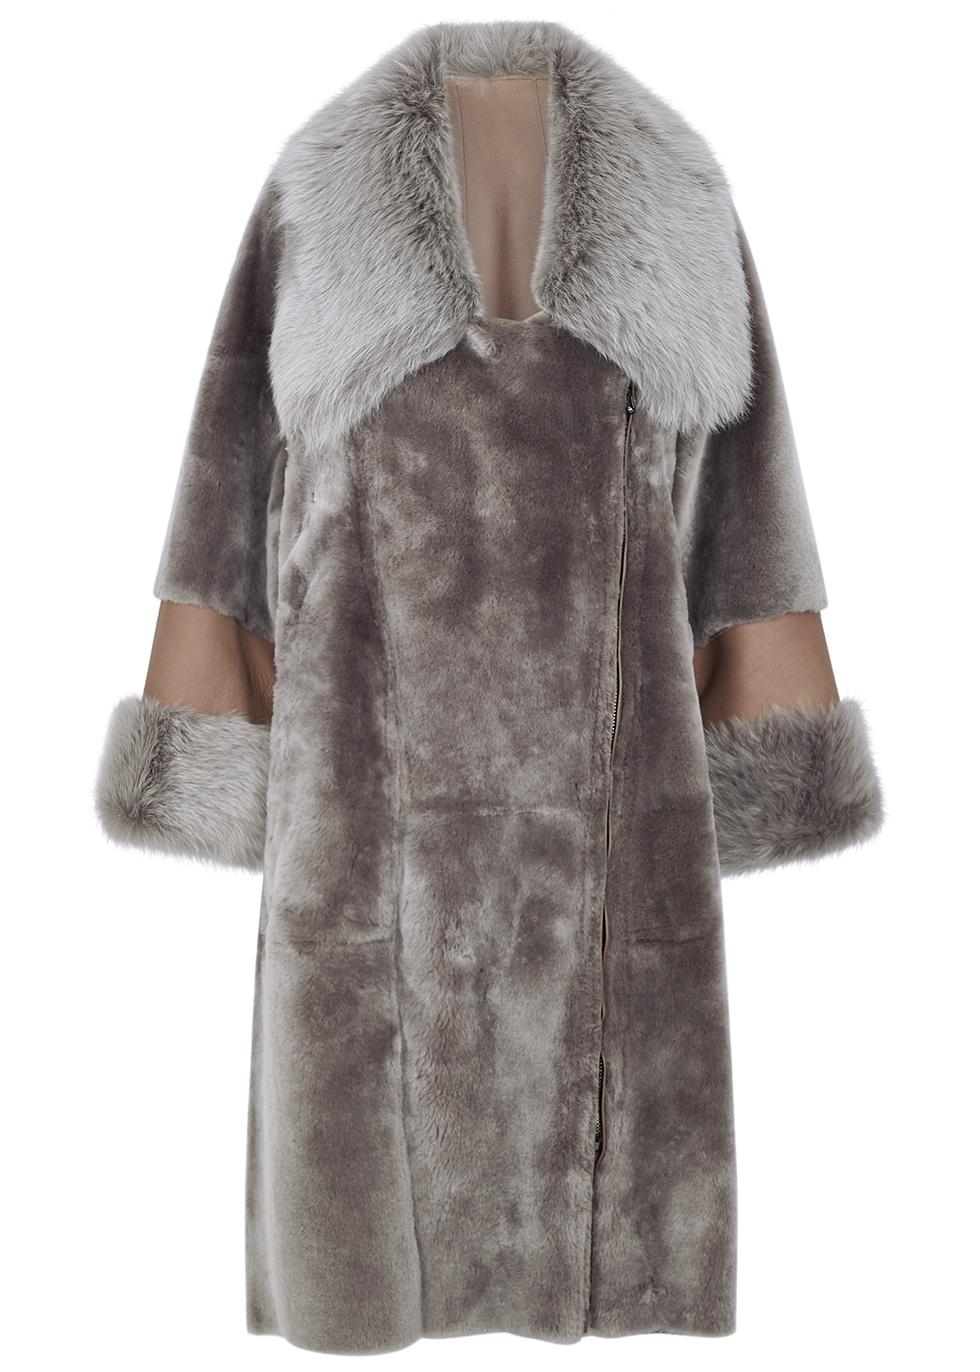 Grey reversible sheepskin coat